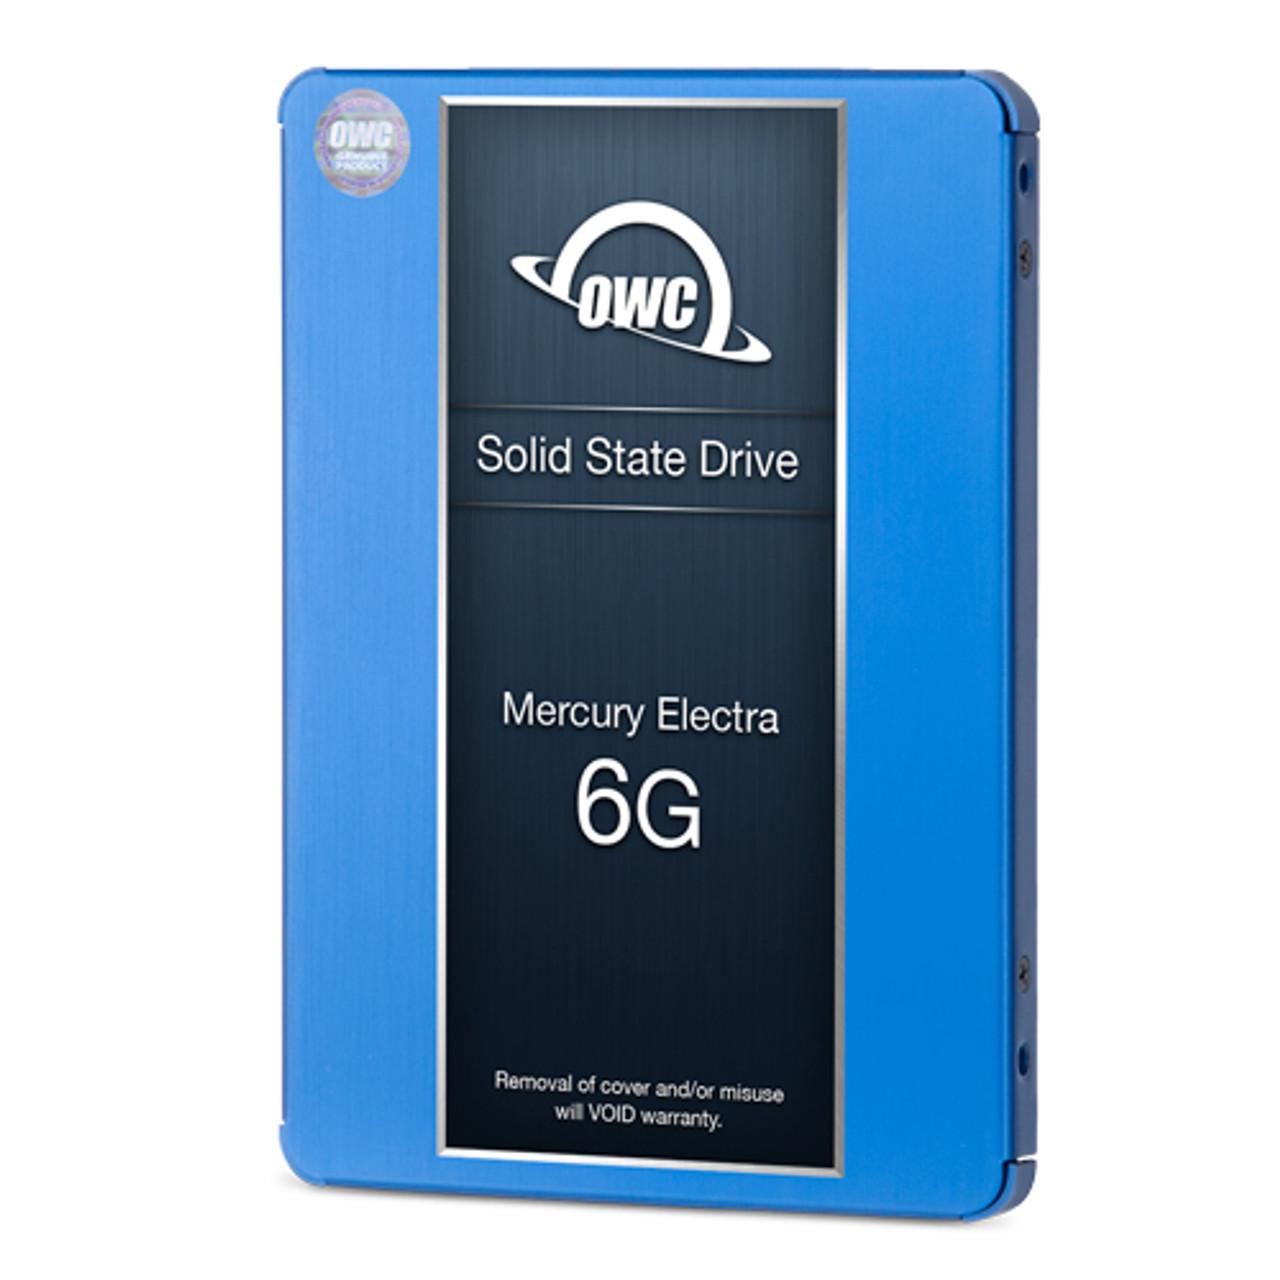 250GB OWC Mercury Electra 6G SSD - SSD Bay Add-In Kit for 2010 27-inch iMacs